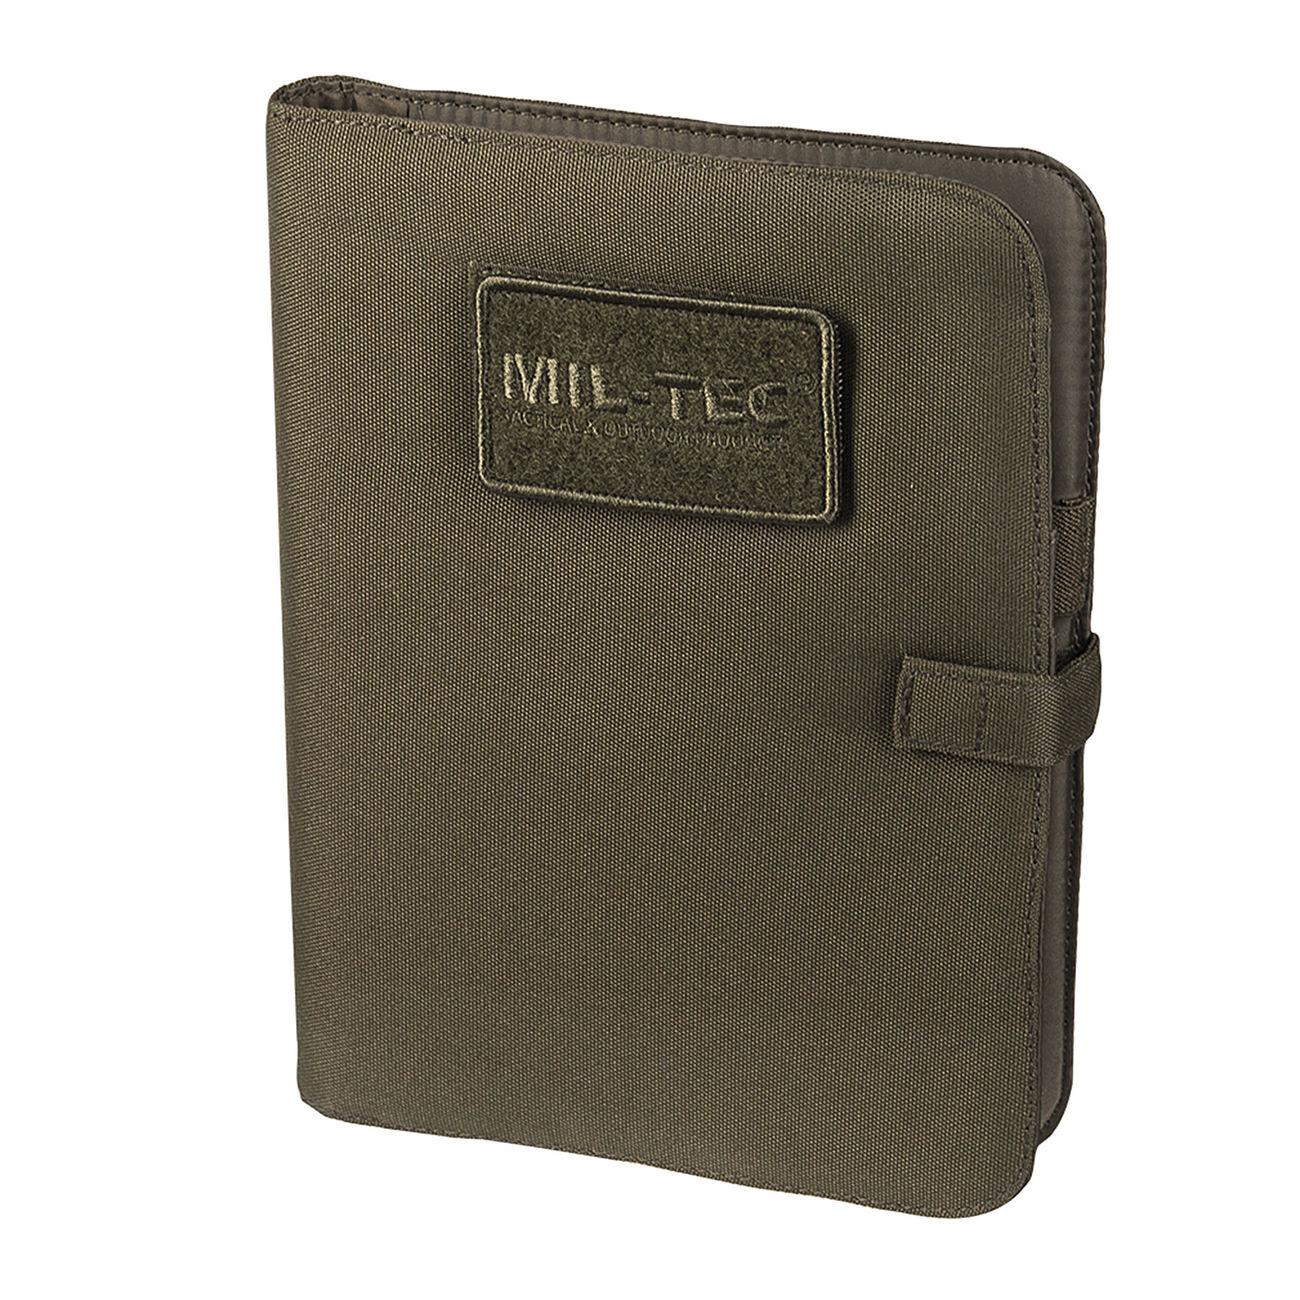 Billiger Preis Mil-tec Tactical Notebook Small Mandra Night Notizbuch Taschen